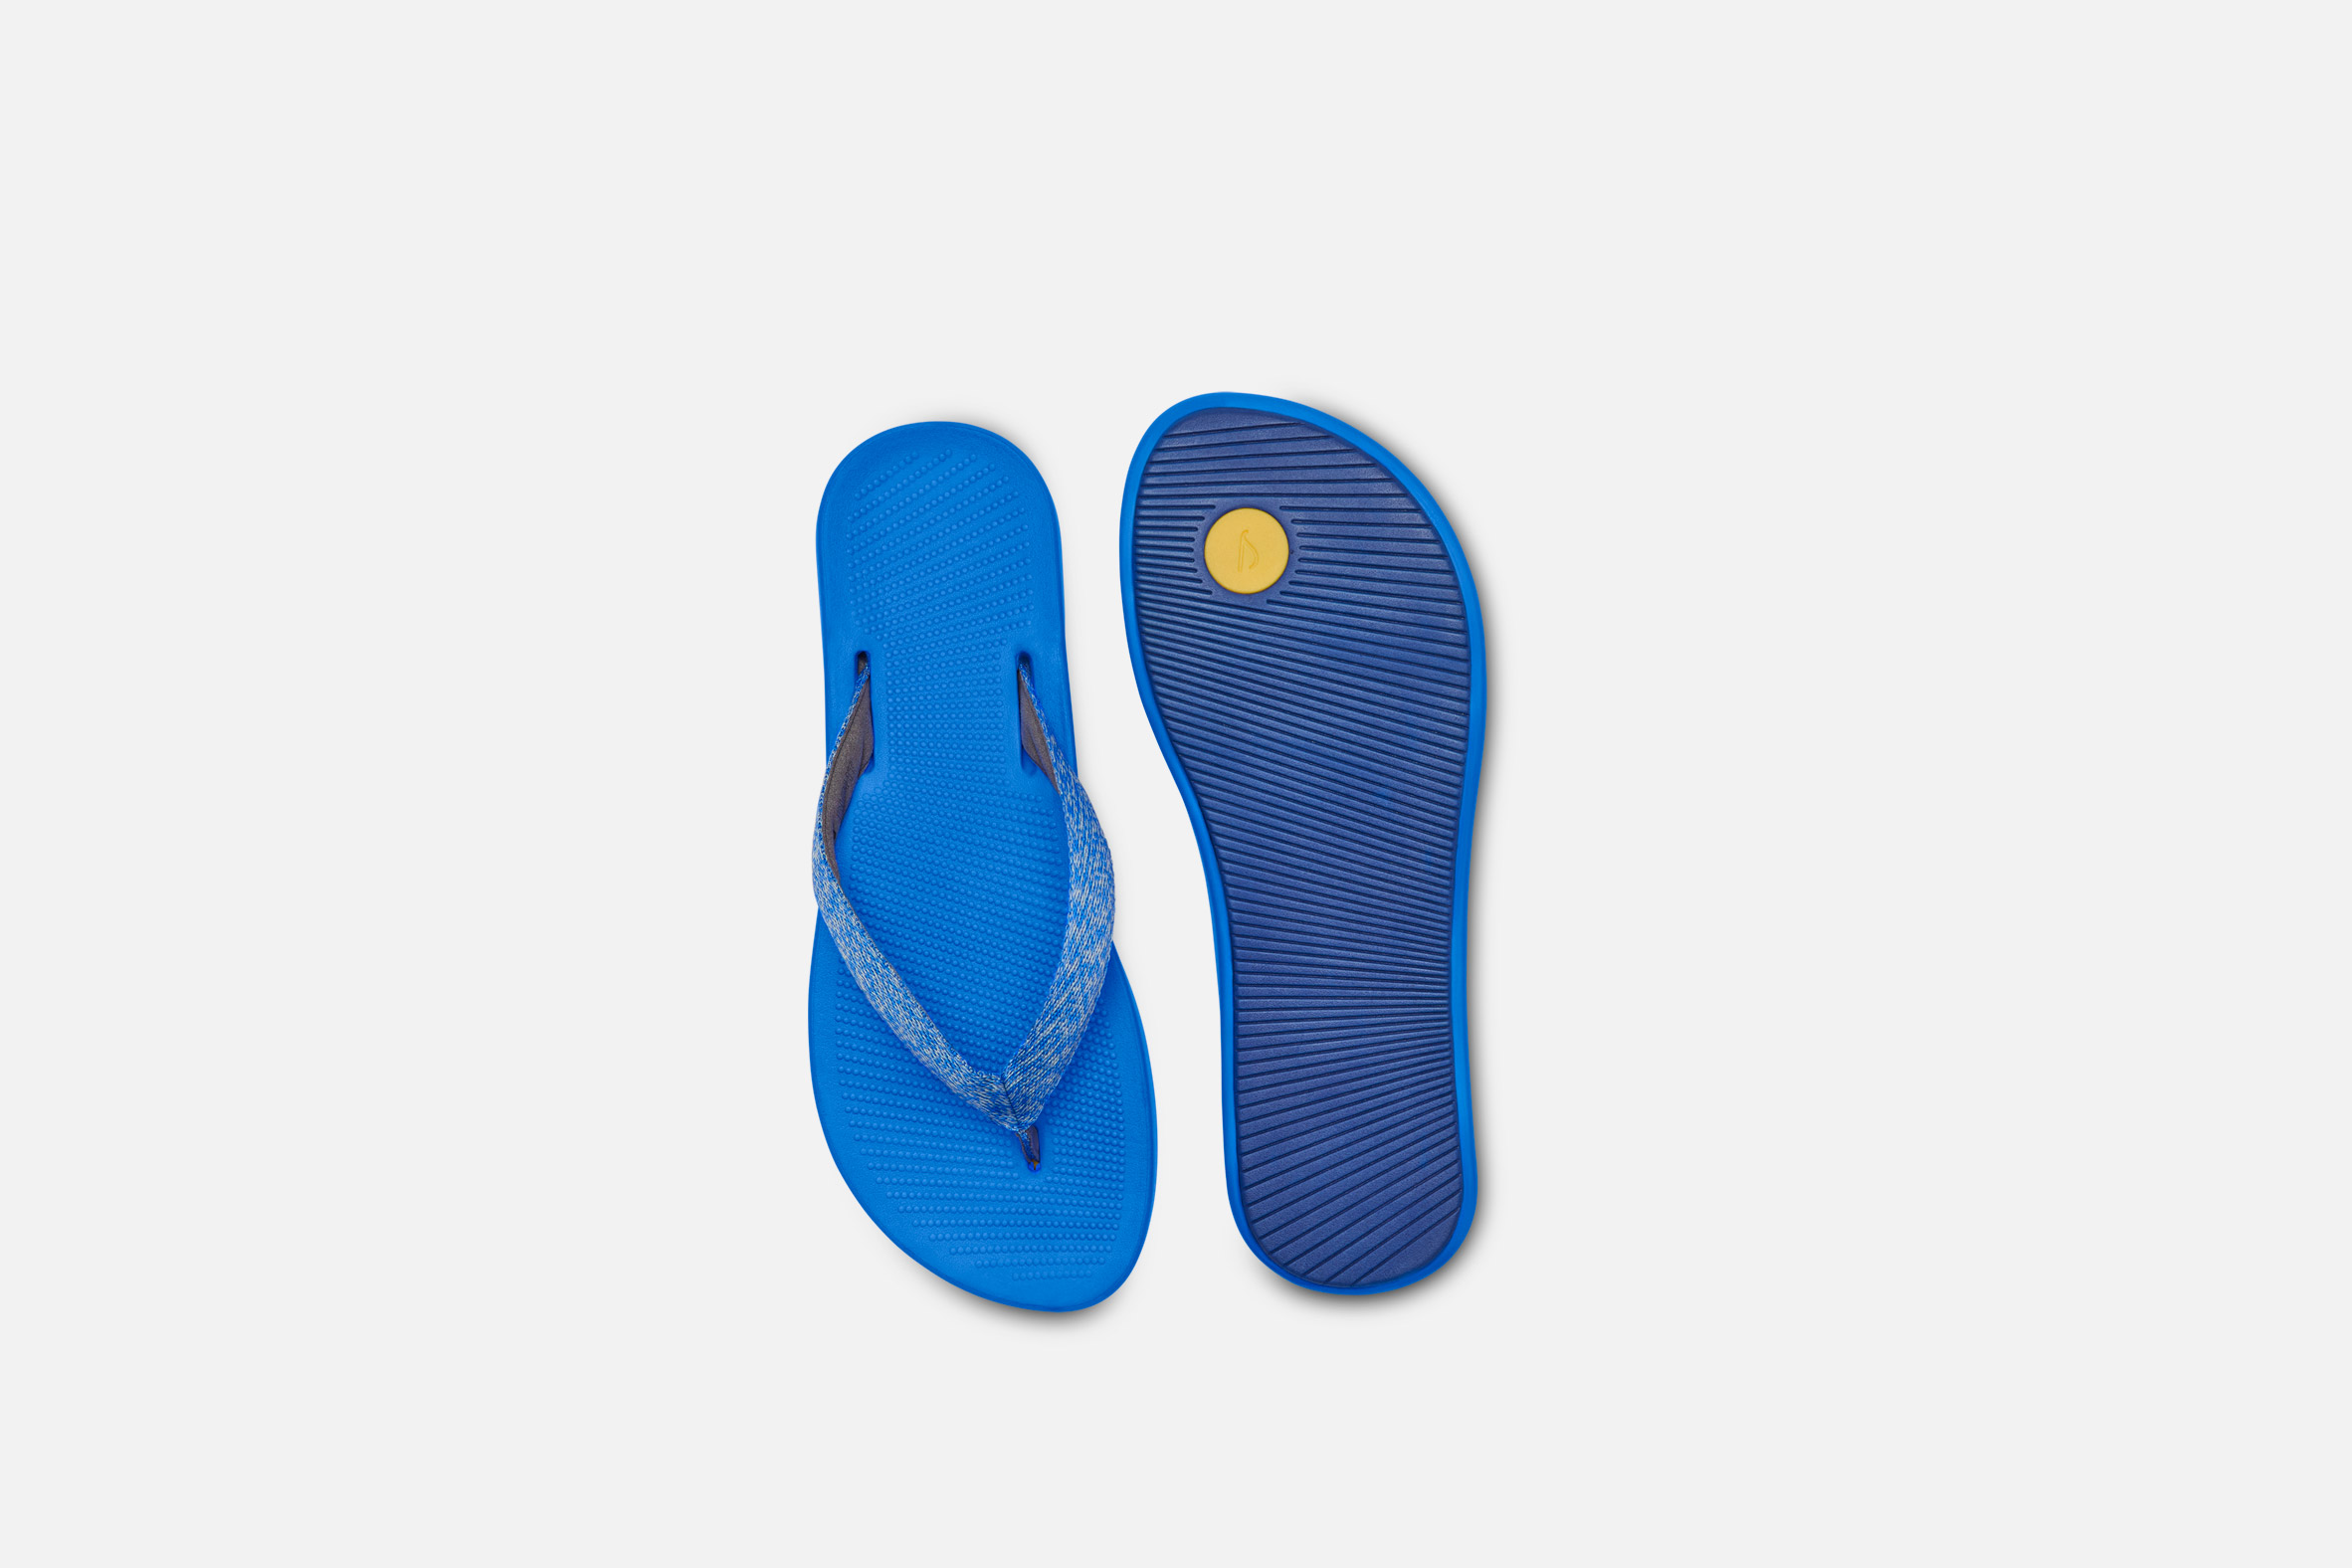 Flip flops with sugar-cane soles